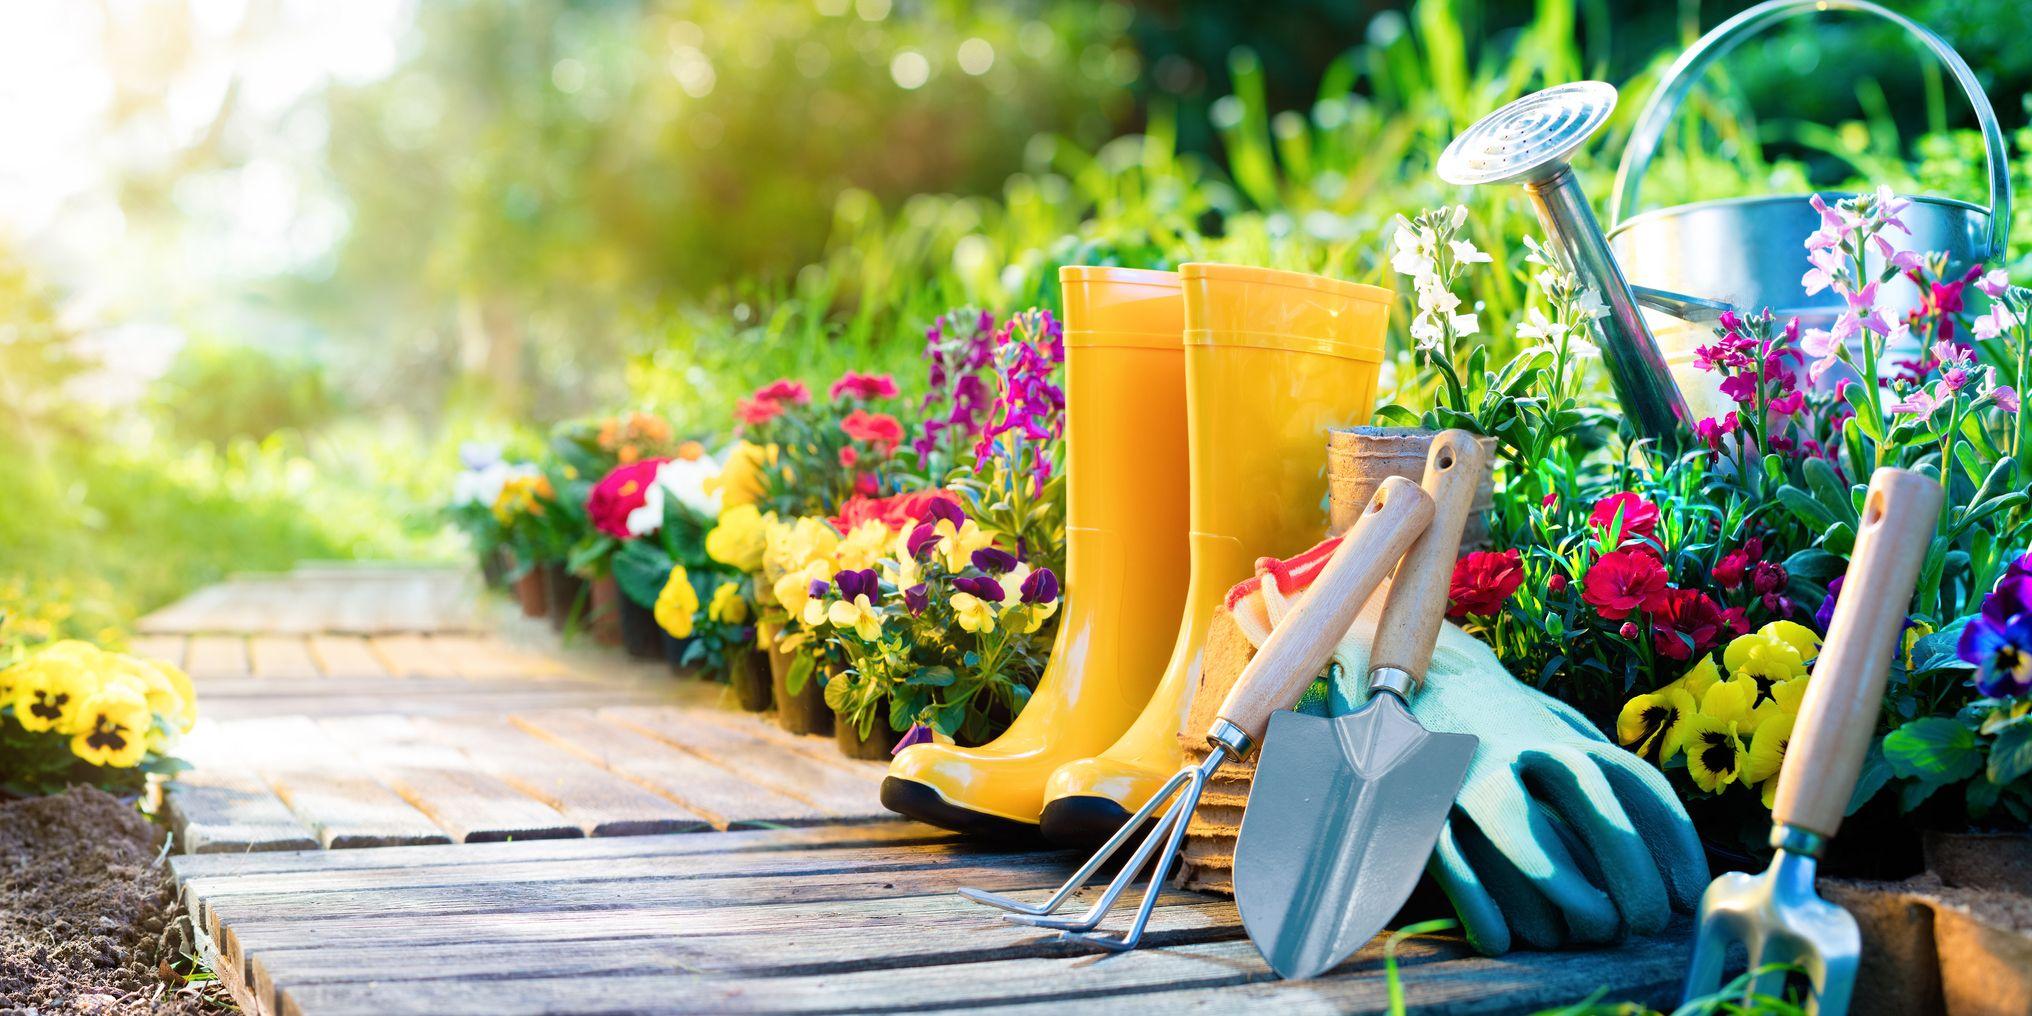 Gardening Supplies Amazing Pictures